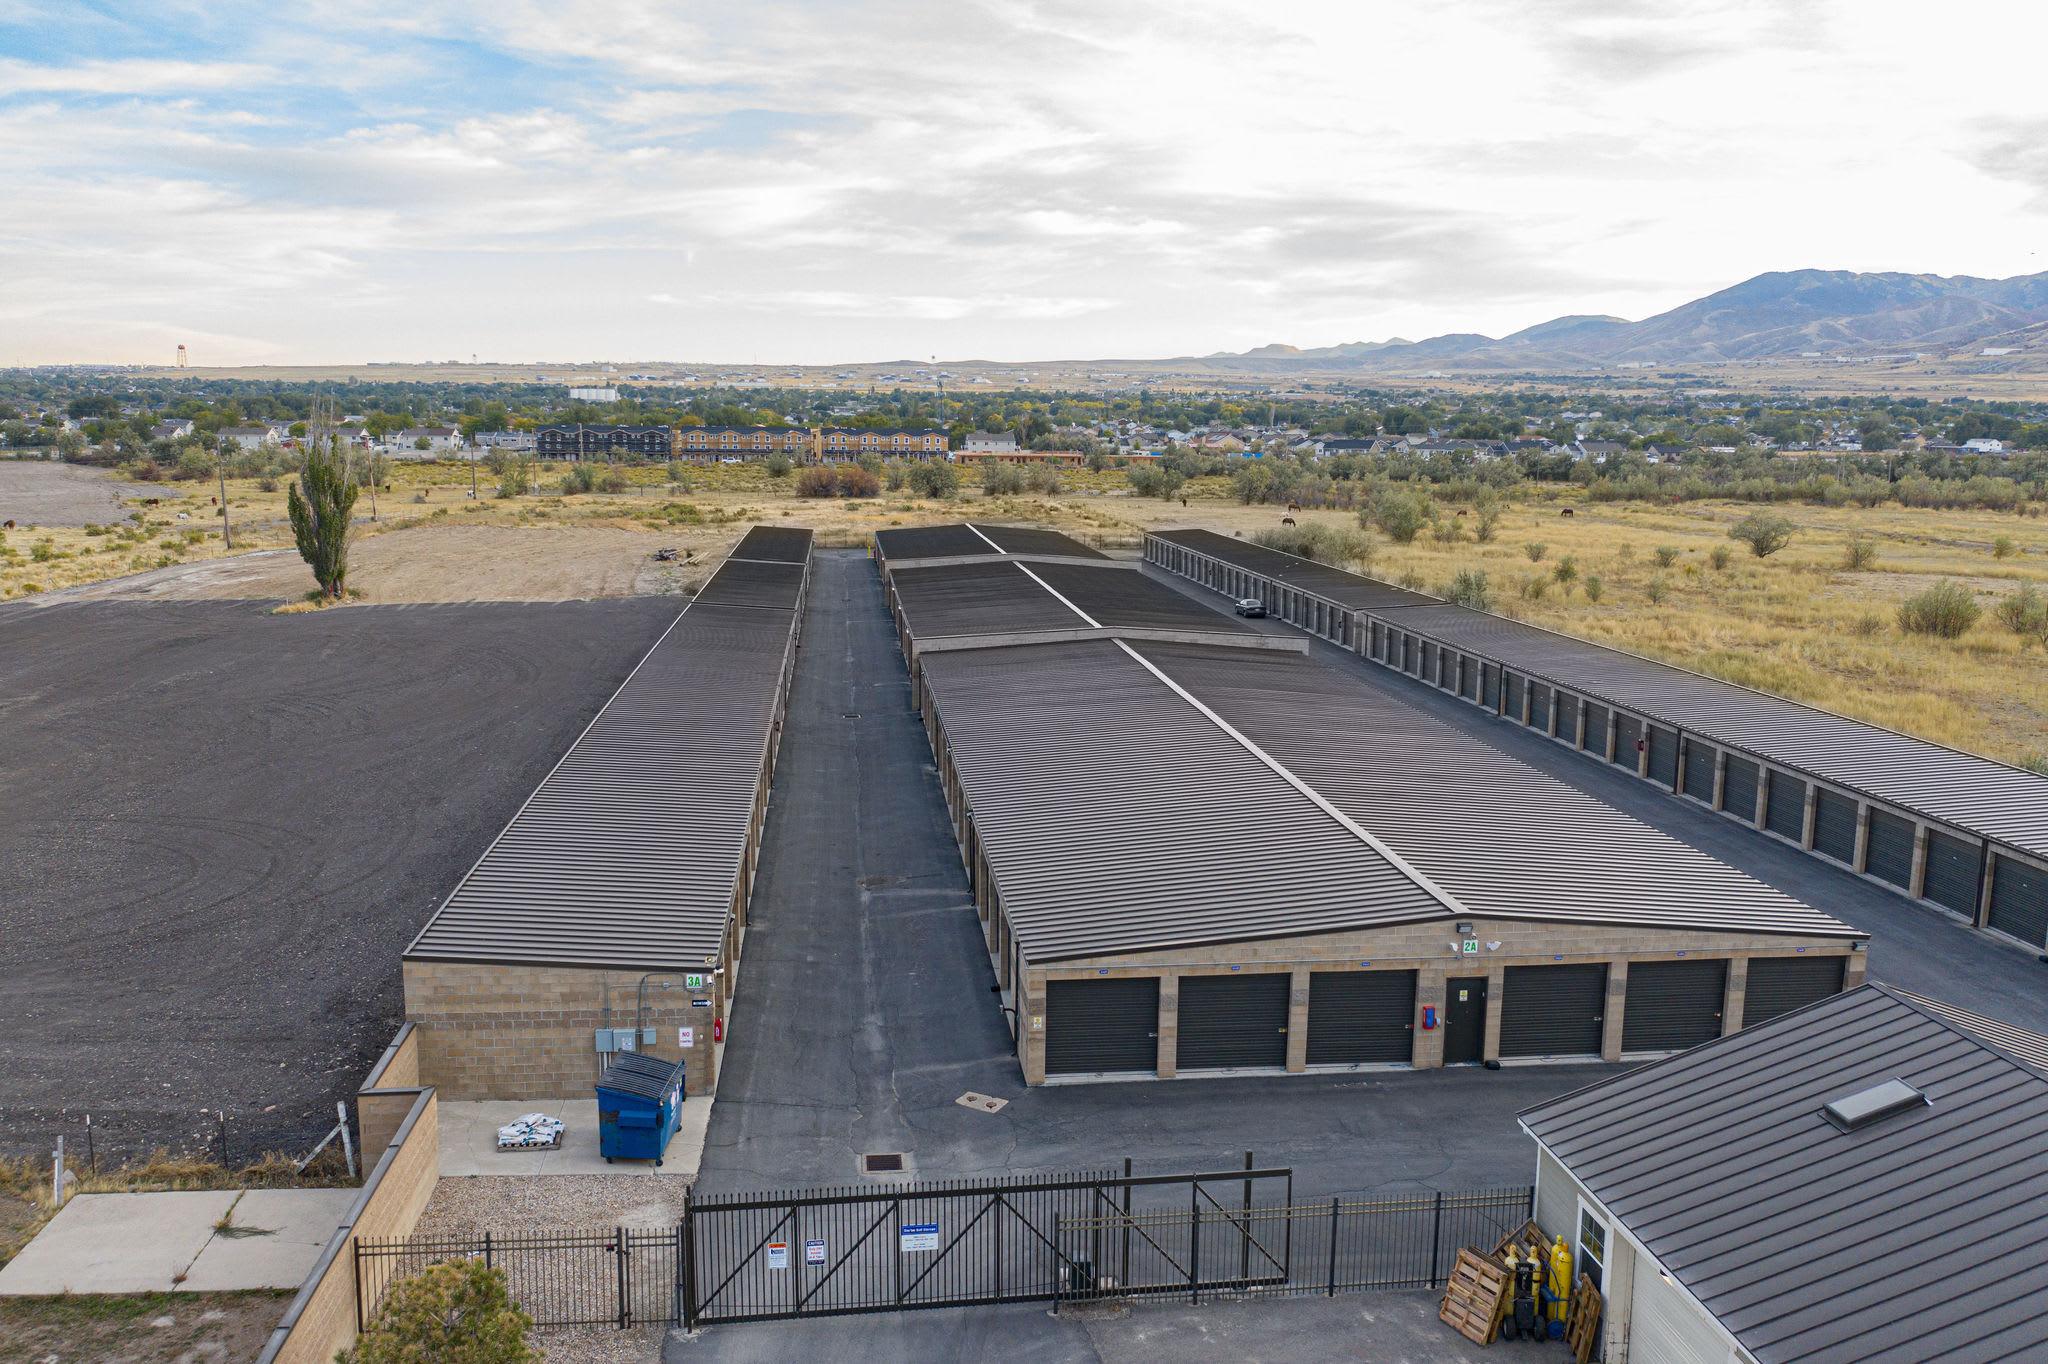 Aerial view of outdoor storage units at Stor'em Self Storage in Magna, Utah